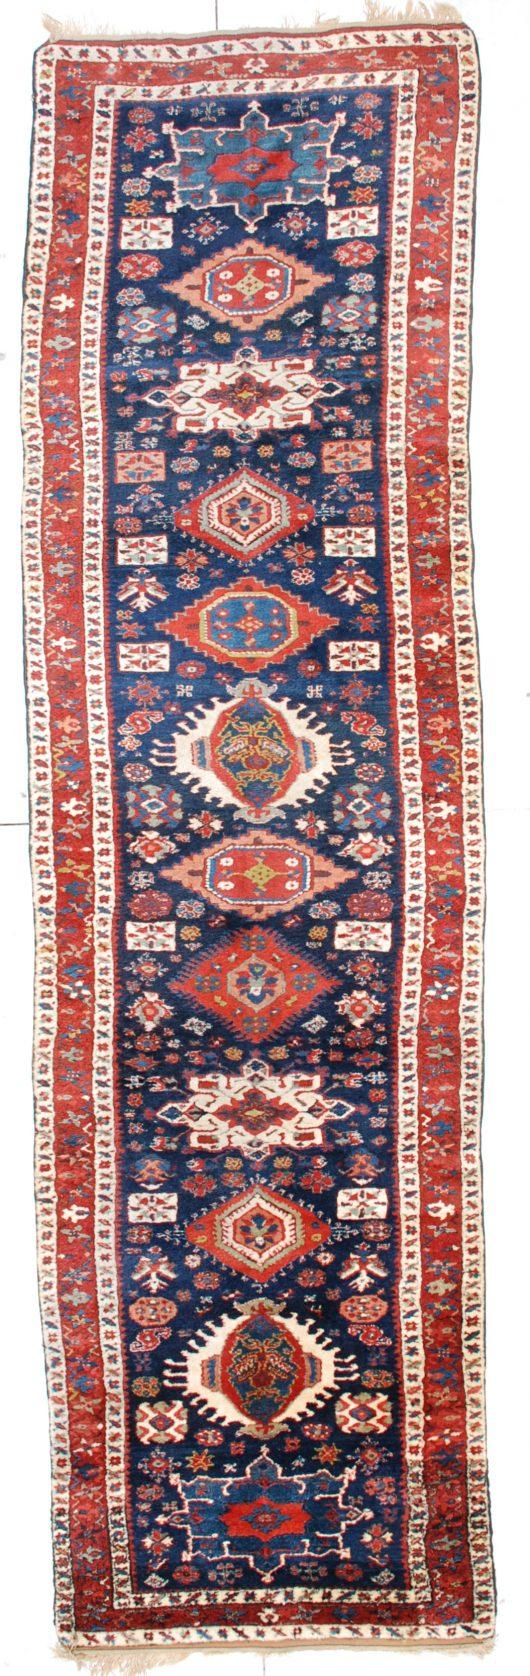 6453 antique Kazak rug runner